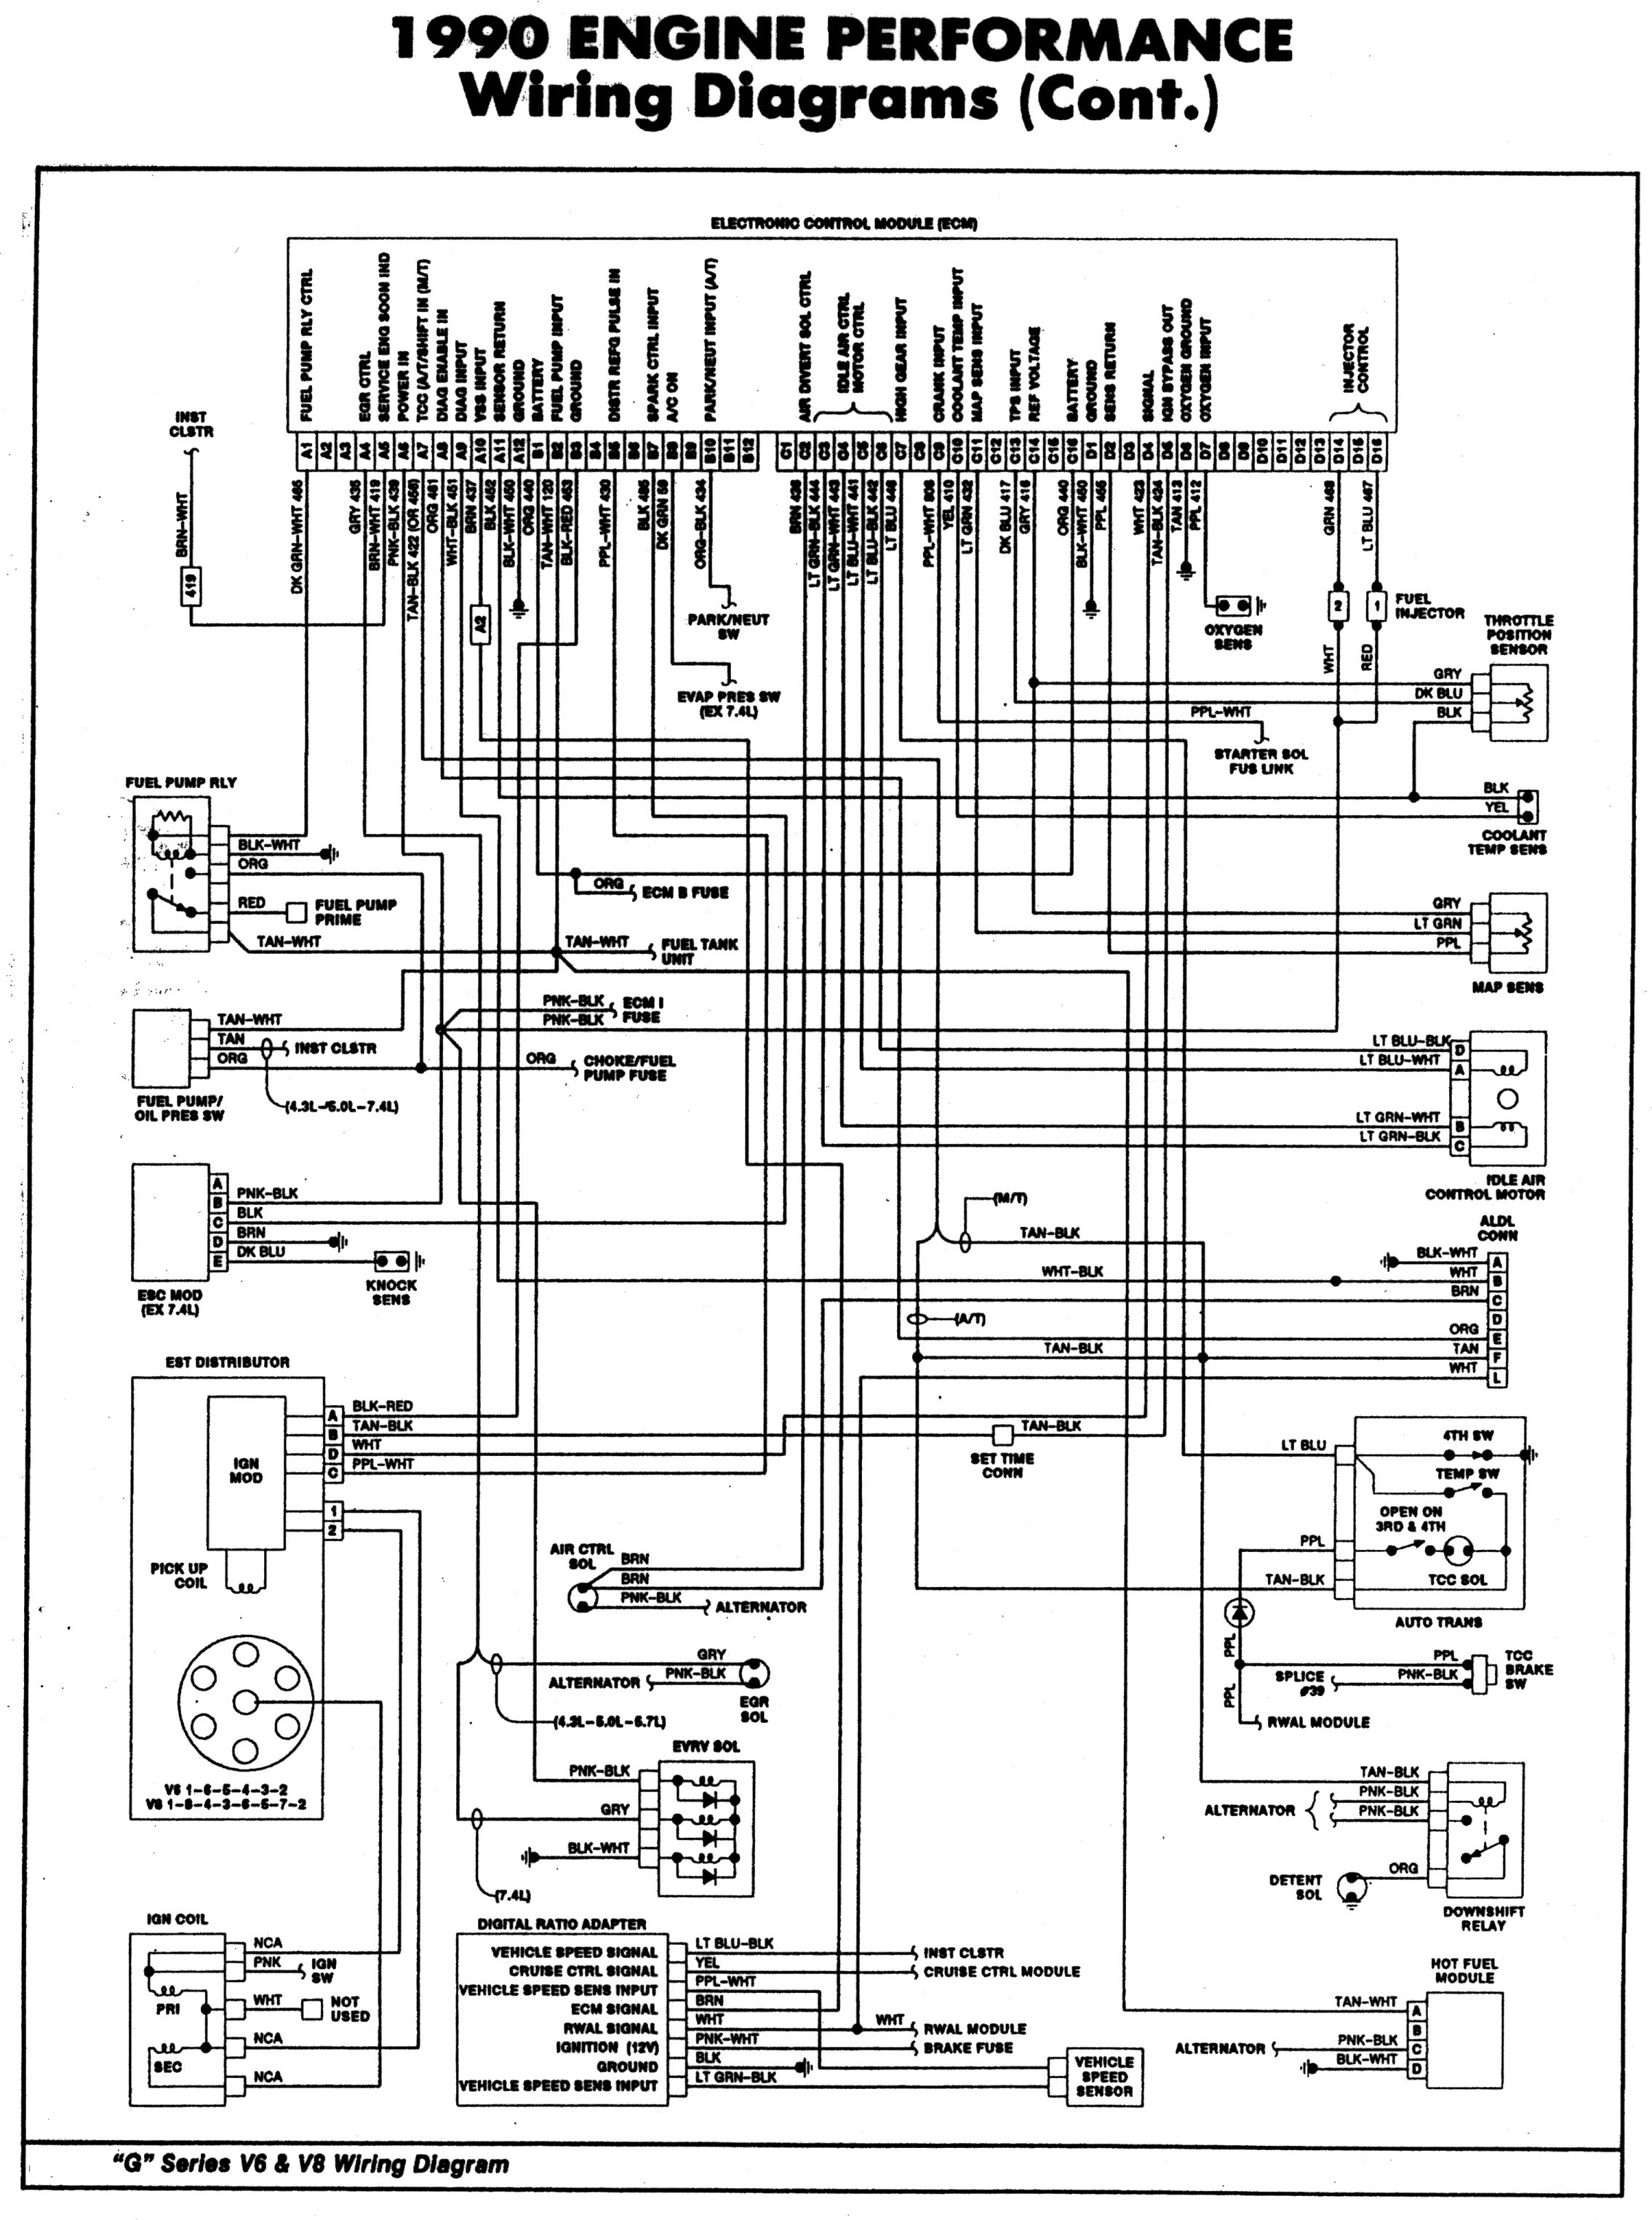 Dodge Ram 1500 Engine Diagram Cummins Diesel Fuel Line Obd2 Wiring 2007 Copy 2002 For Coachedby Of